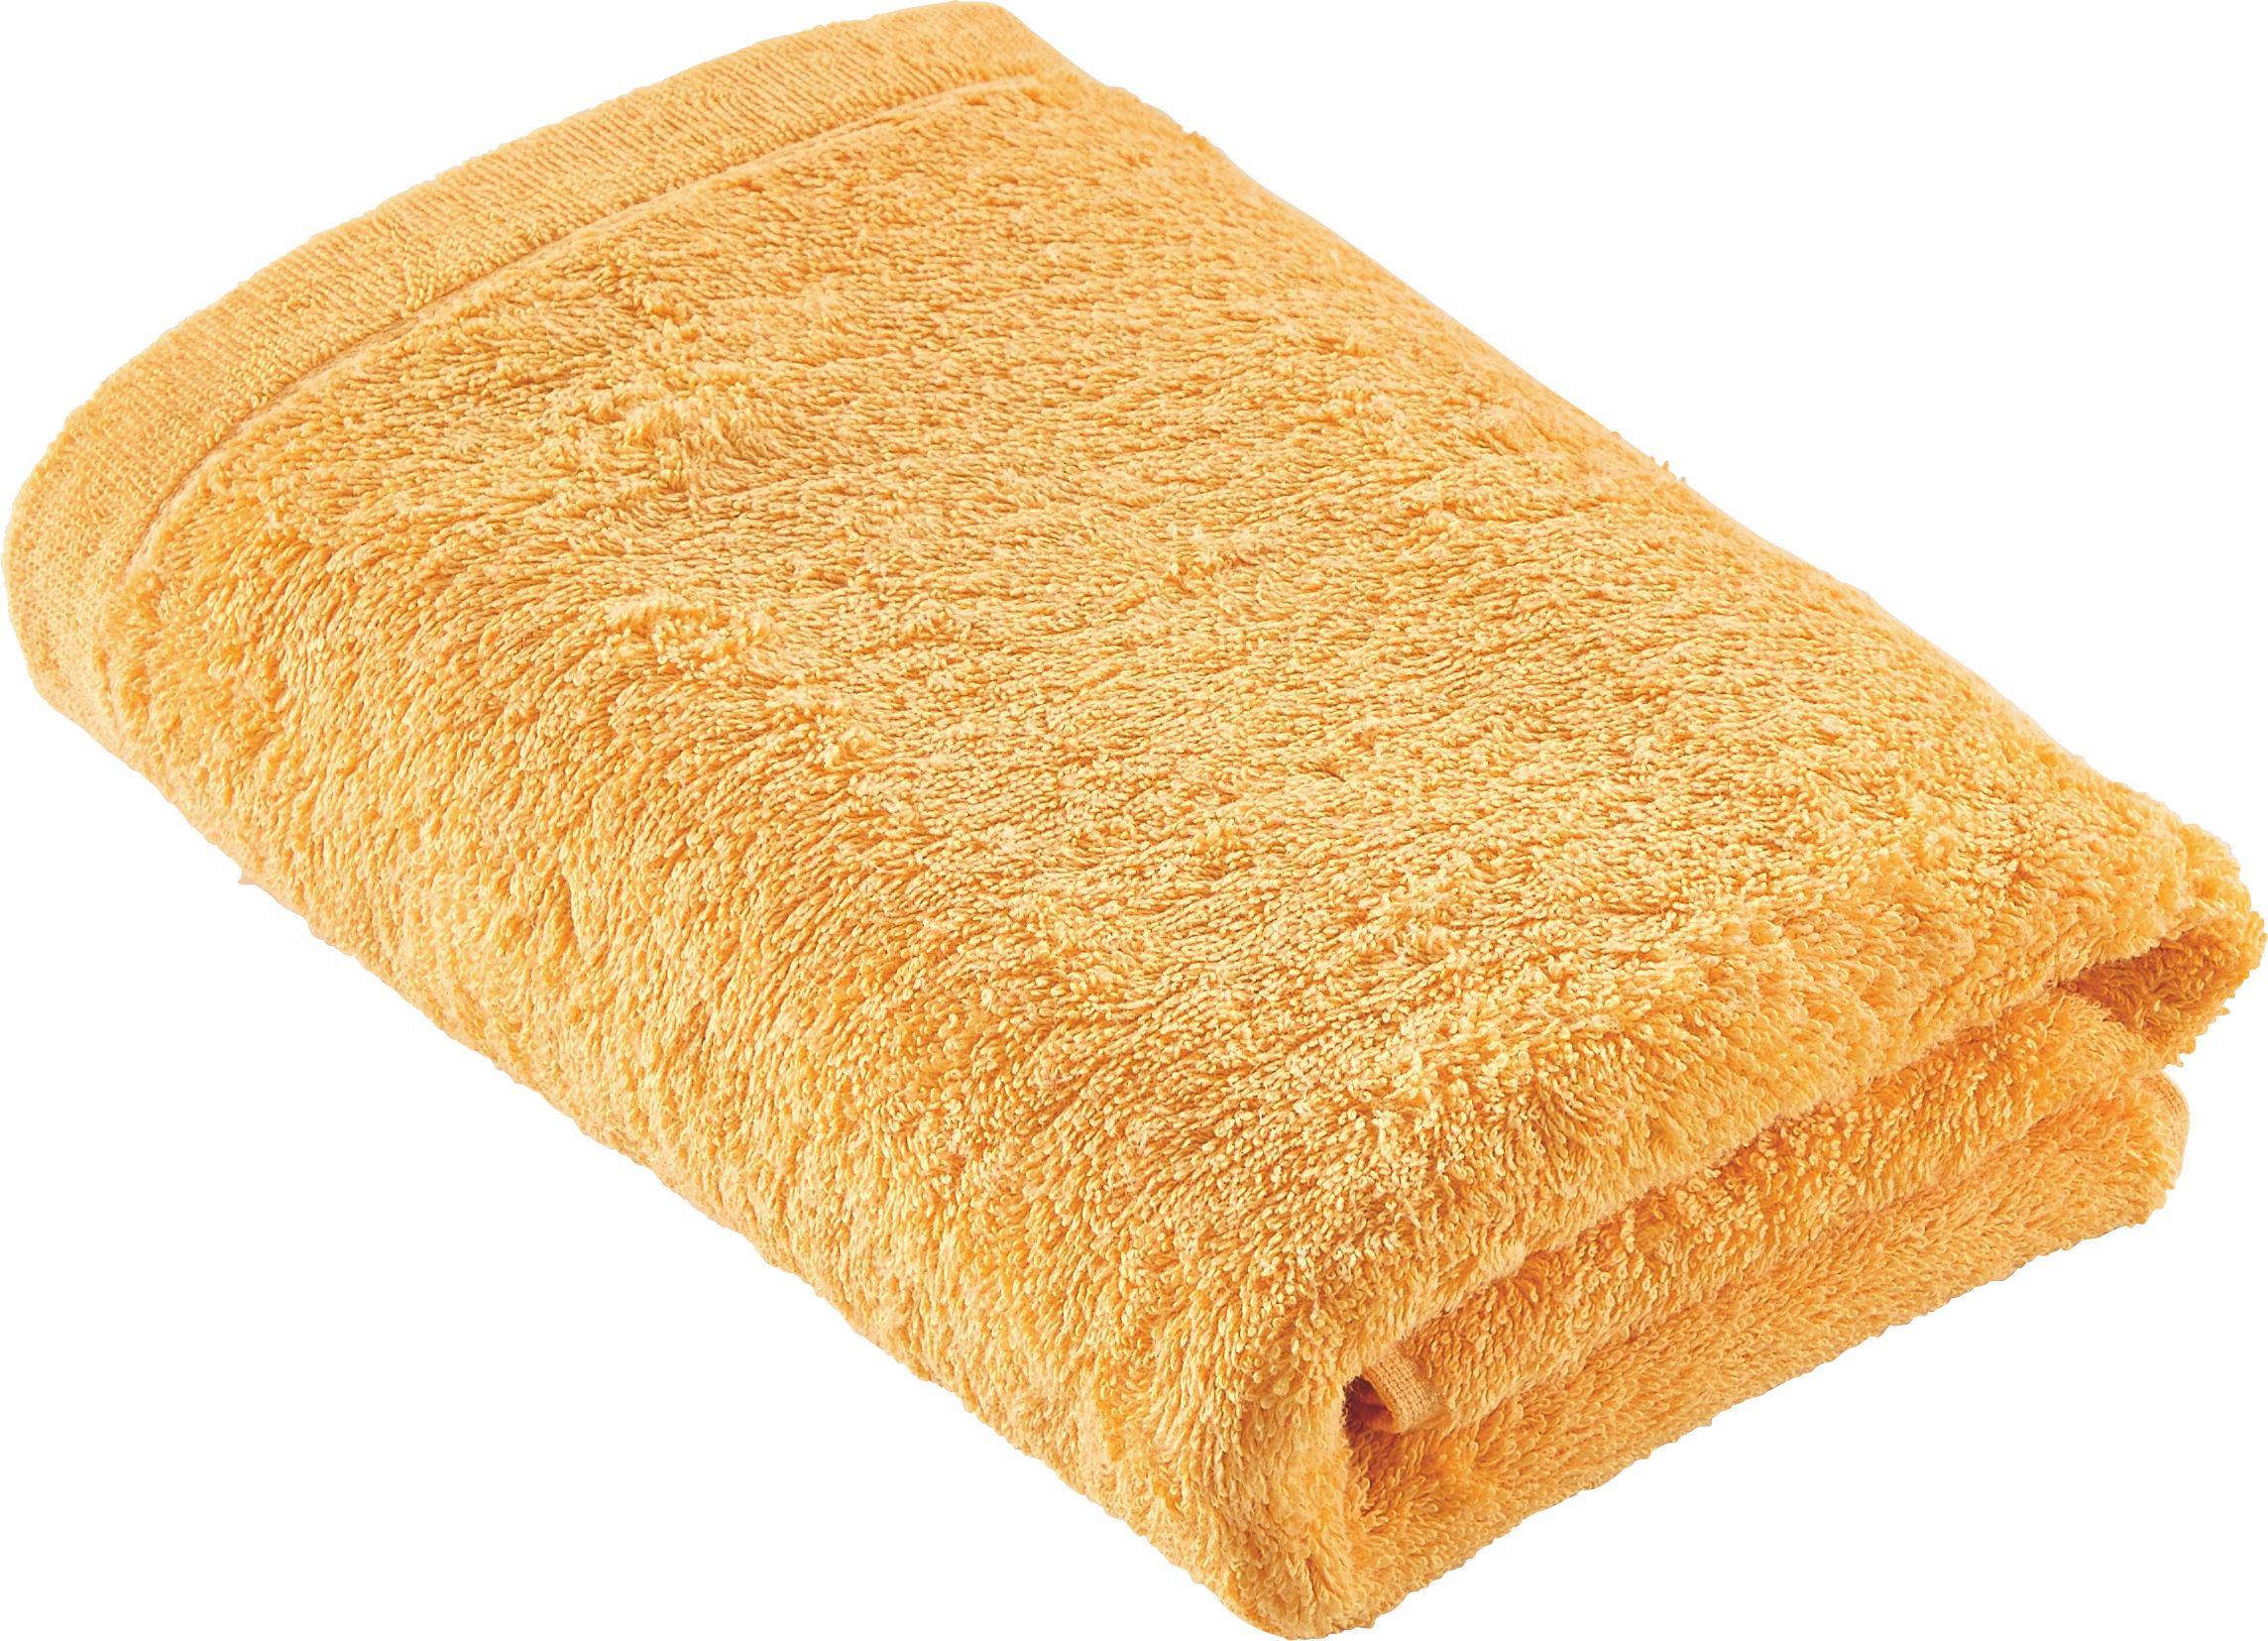 HANDTUCH 50/100 cm - Orange, Basics, Textil (50/100cm) - CAWOE